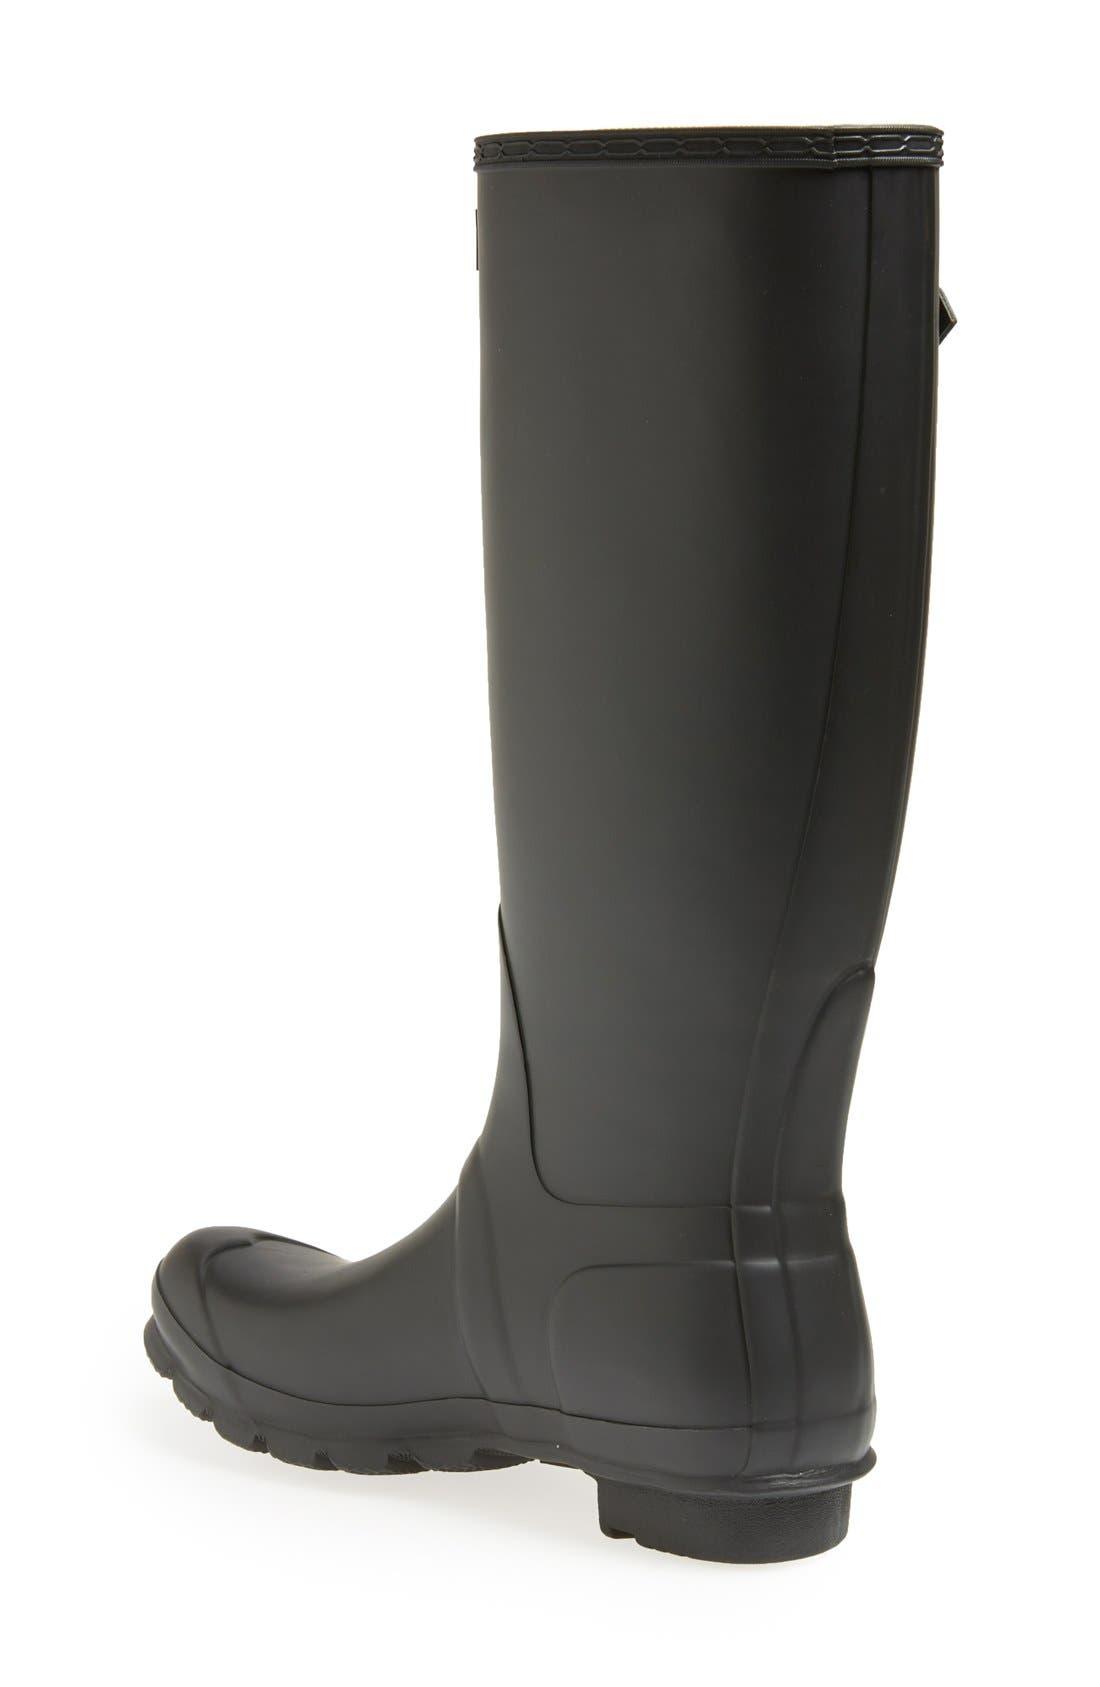 Womens Low Heel 1 2 Shoes Nordstrom Elaine Teal Top Leux Studio L